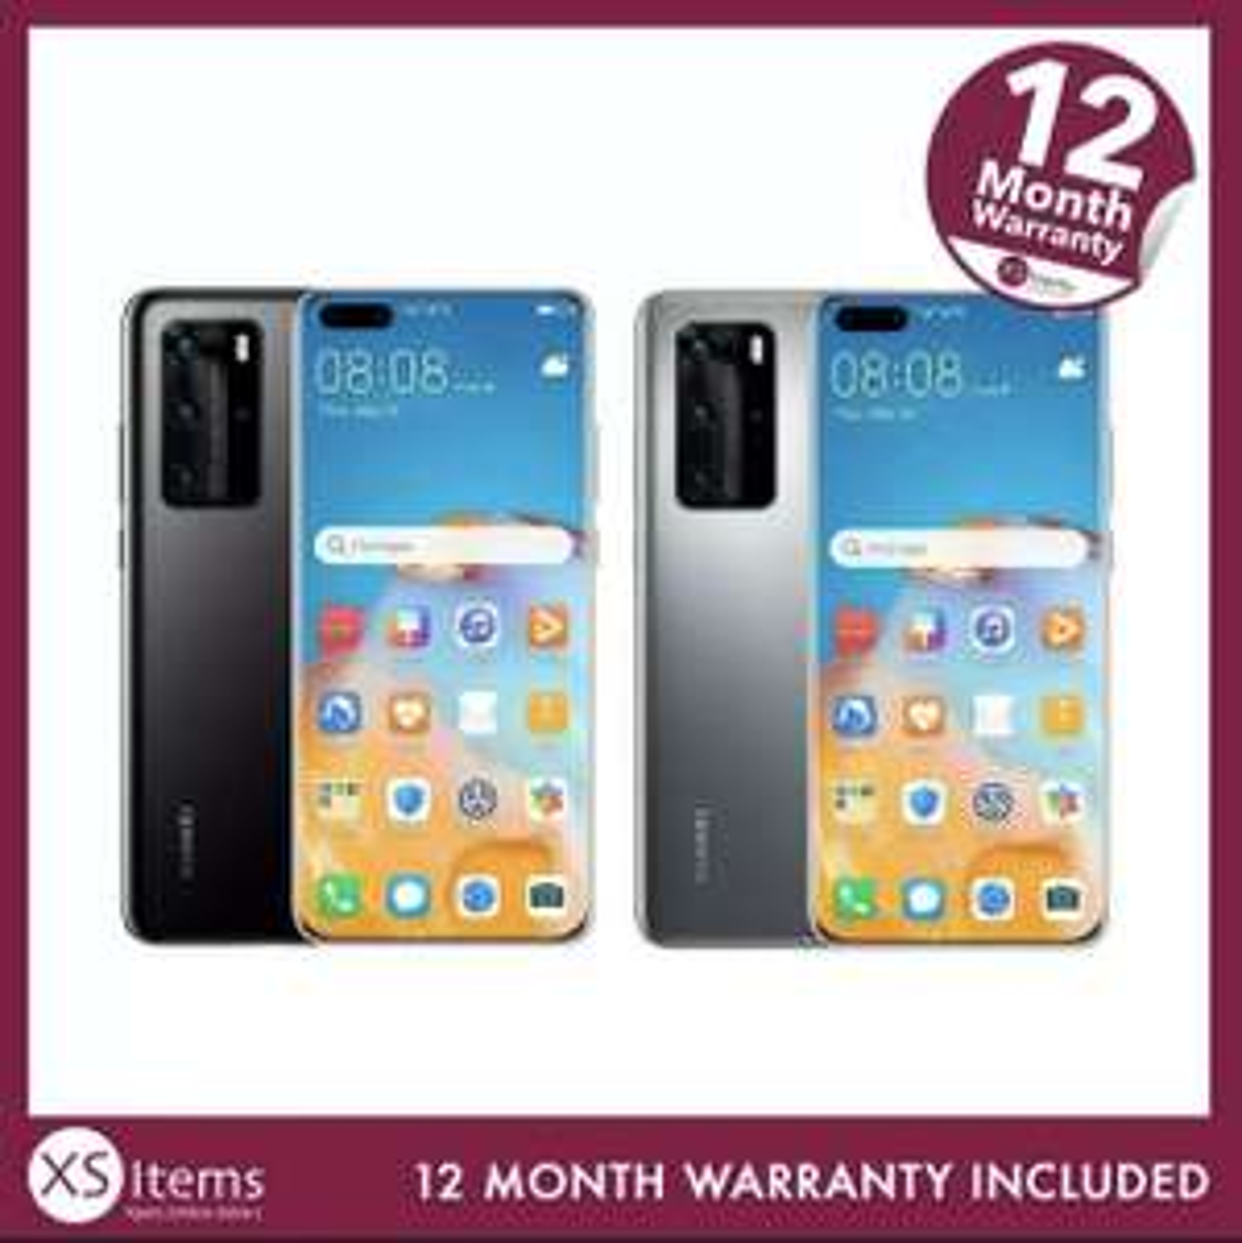 Huawei P40 Pro - 256GB - Silver Frost - Grade A - £397.24 , Grade B - £379.24 , Grade C - £361.24 at xsitems_ltd ebay